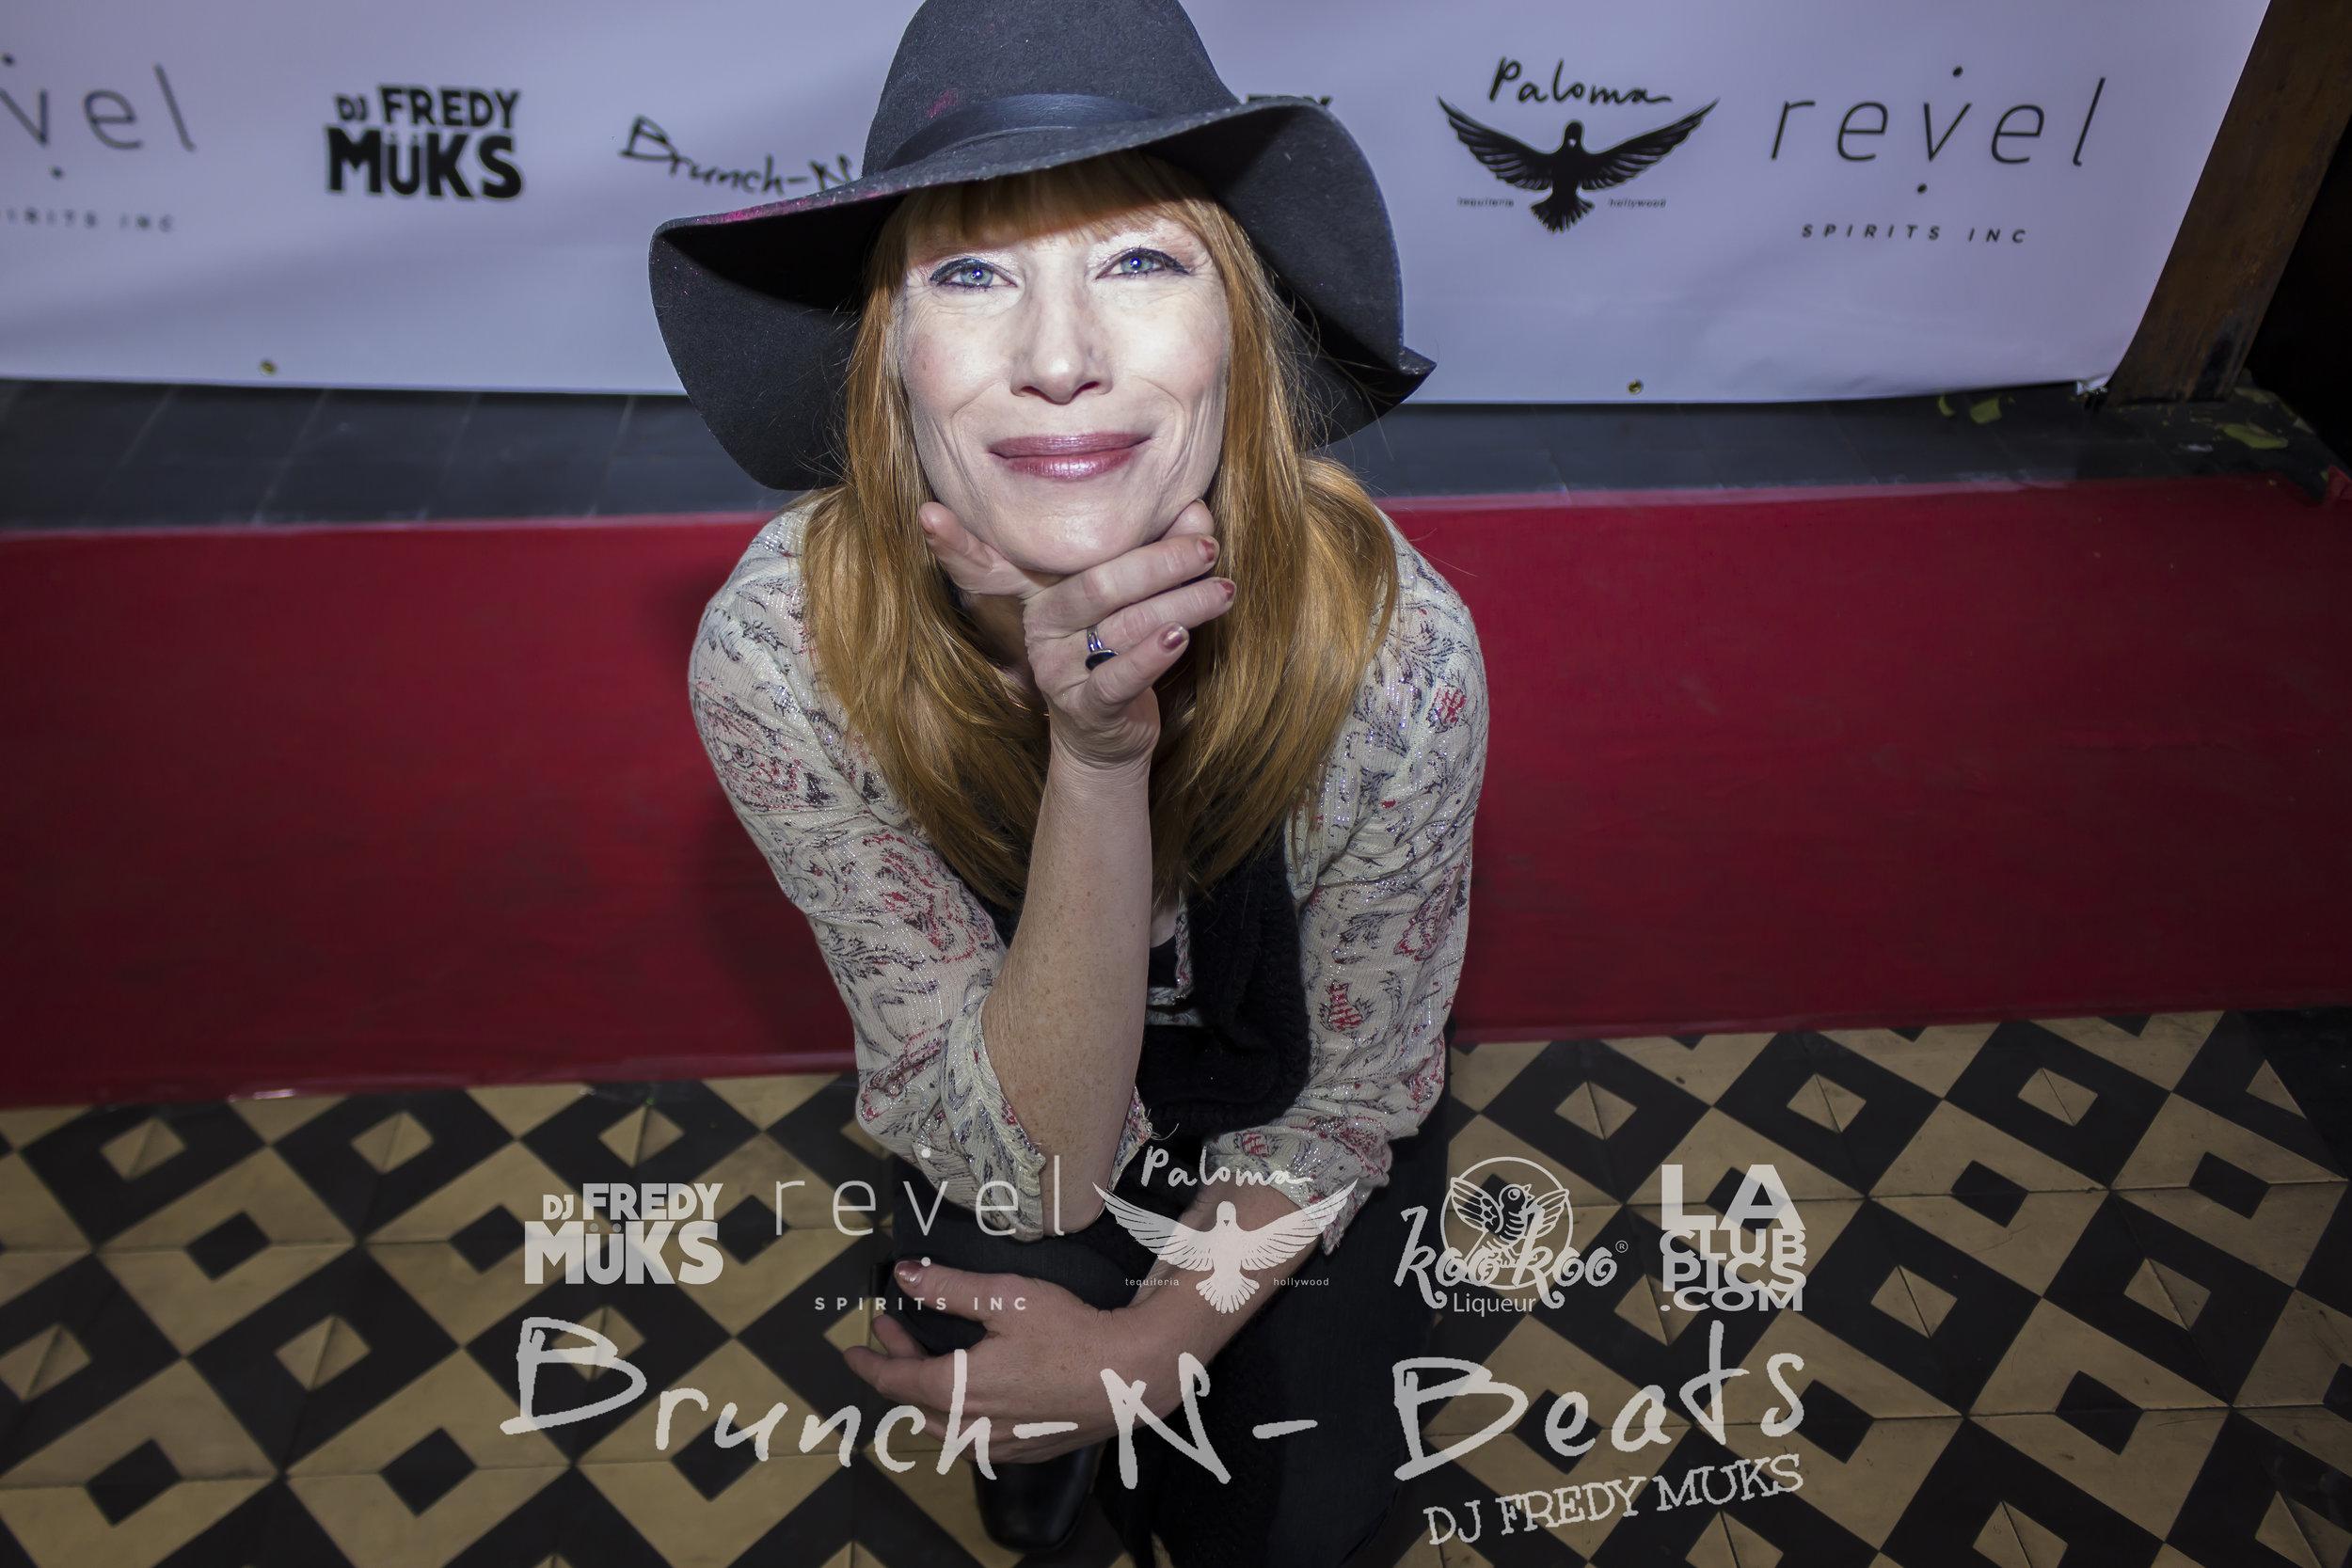 Brunch-N-Beats - Paloma Hollywood - 02-25-18_39.jpg